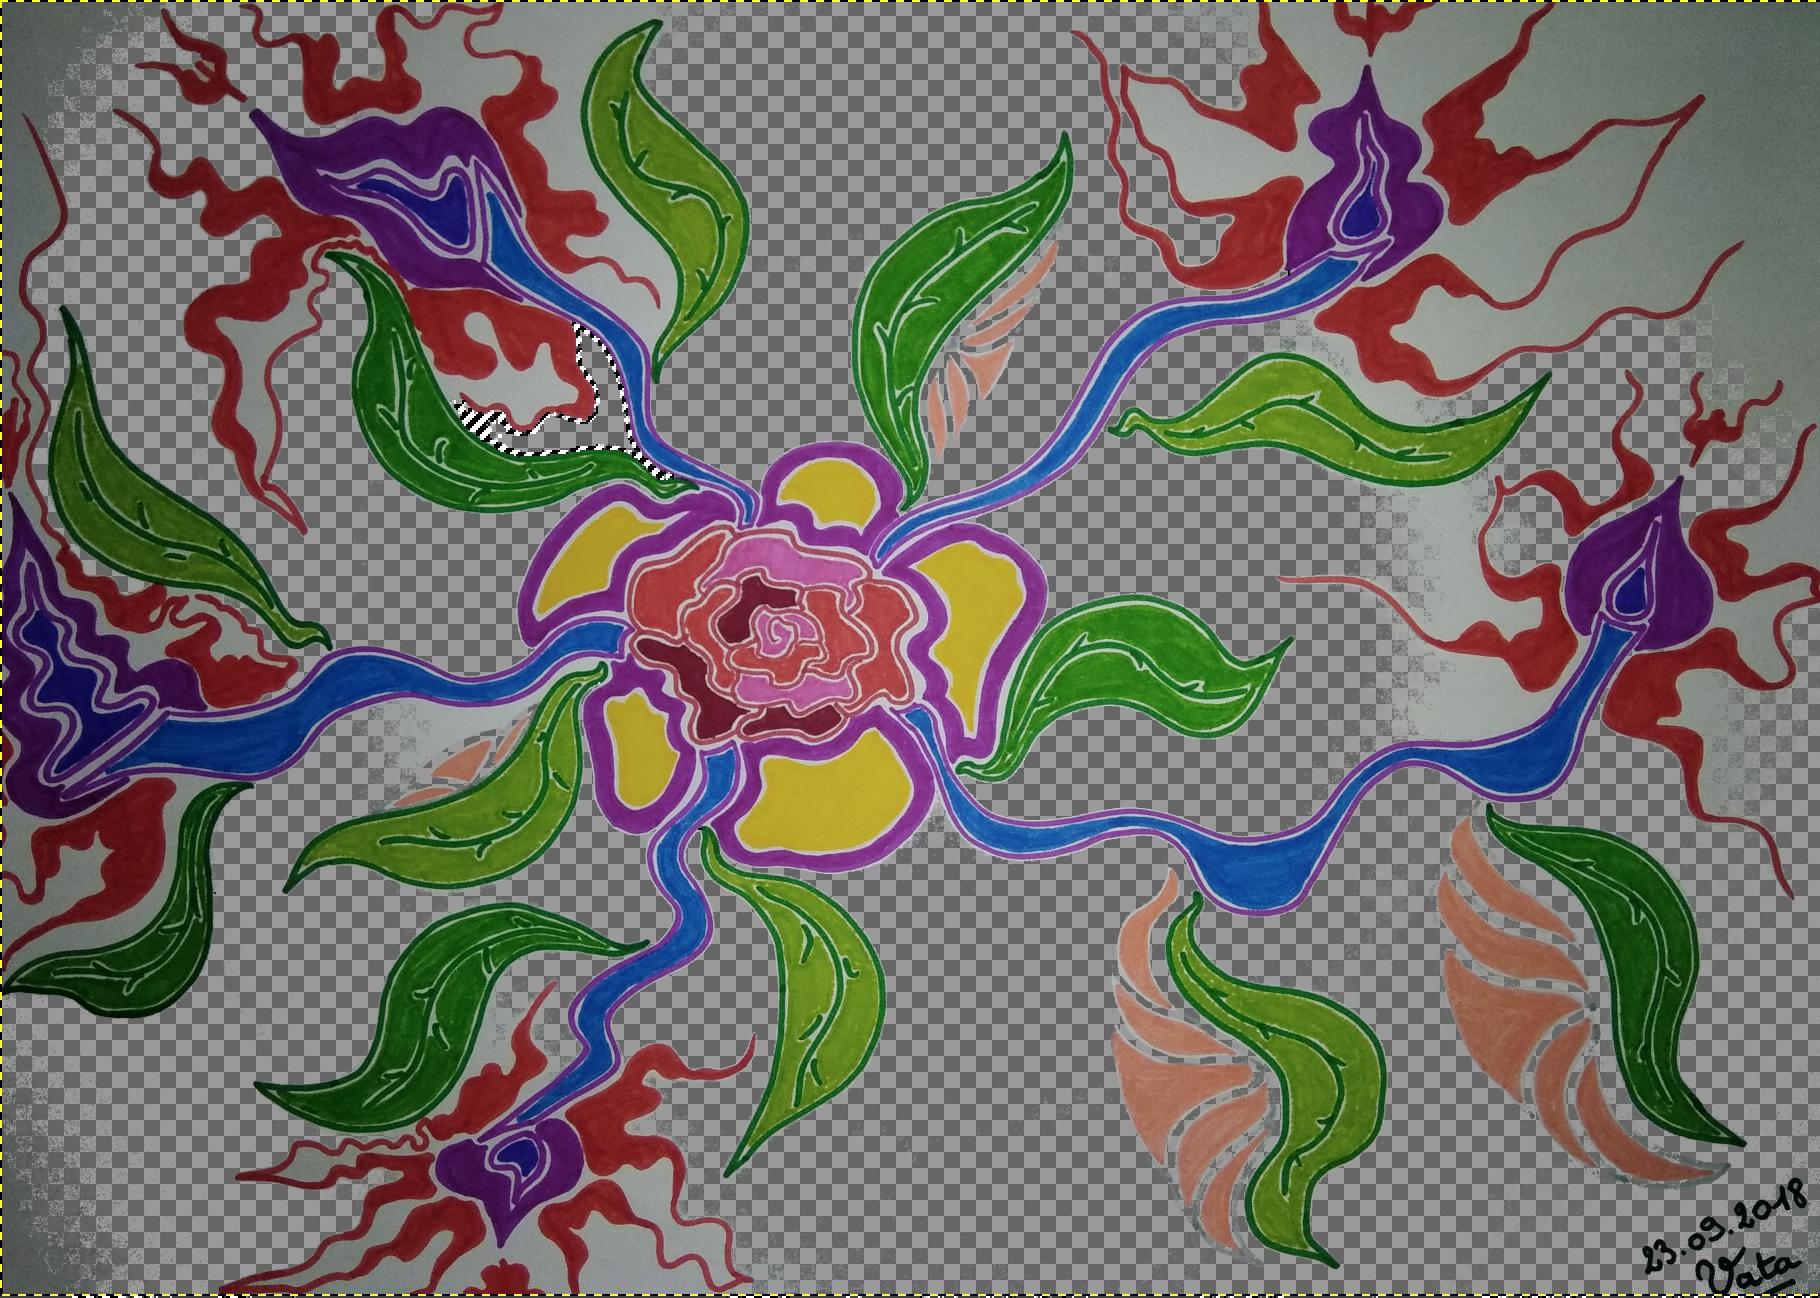 Dessin fleurs fin septembre 2018 Vata De